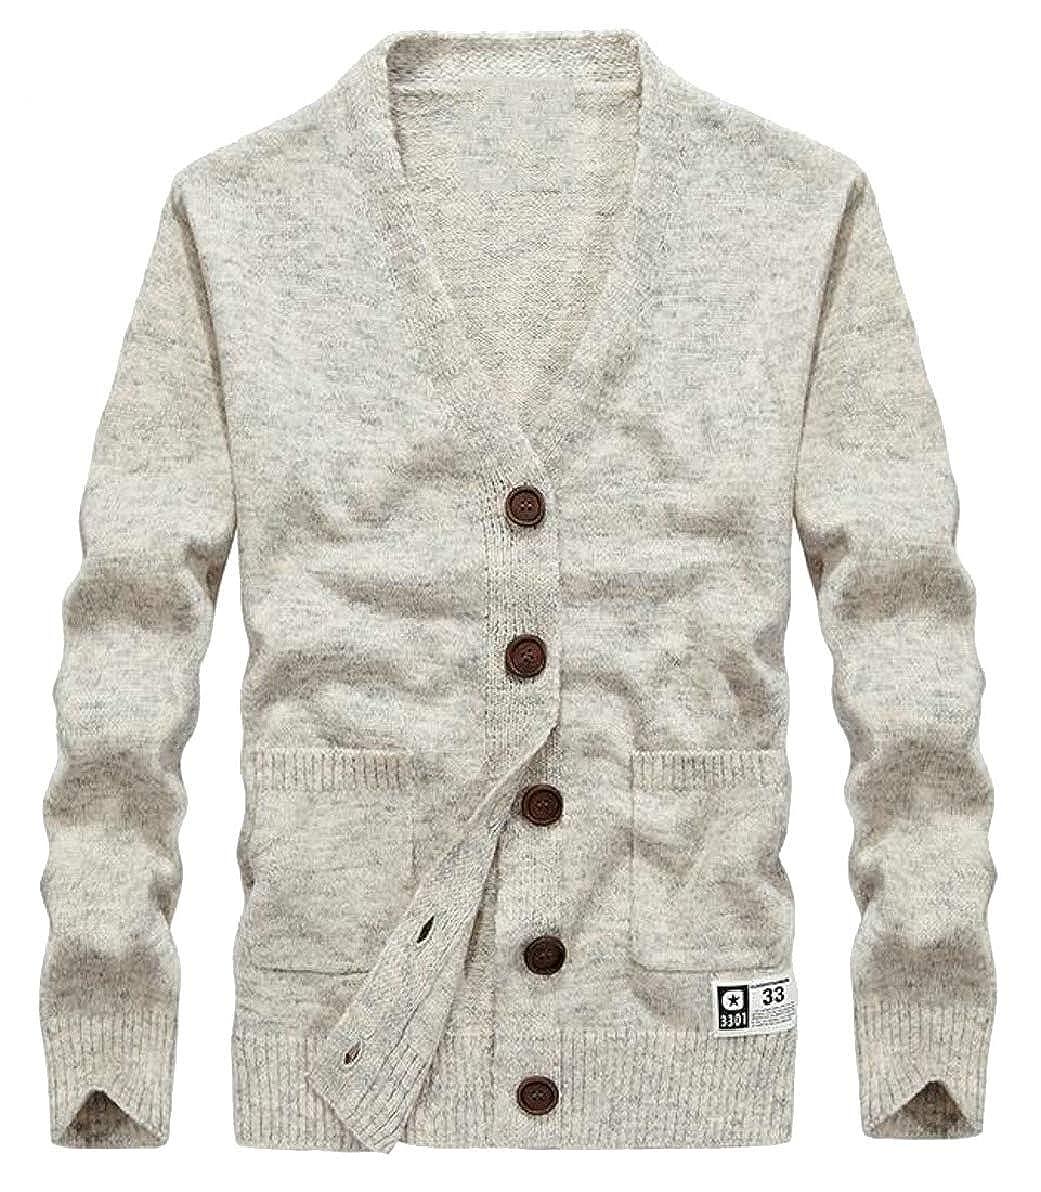 ONTBYB Mens Slim V Neck Button Up Pocket Long Sleeve Cardigan Sweater